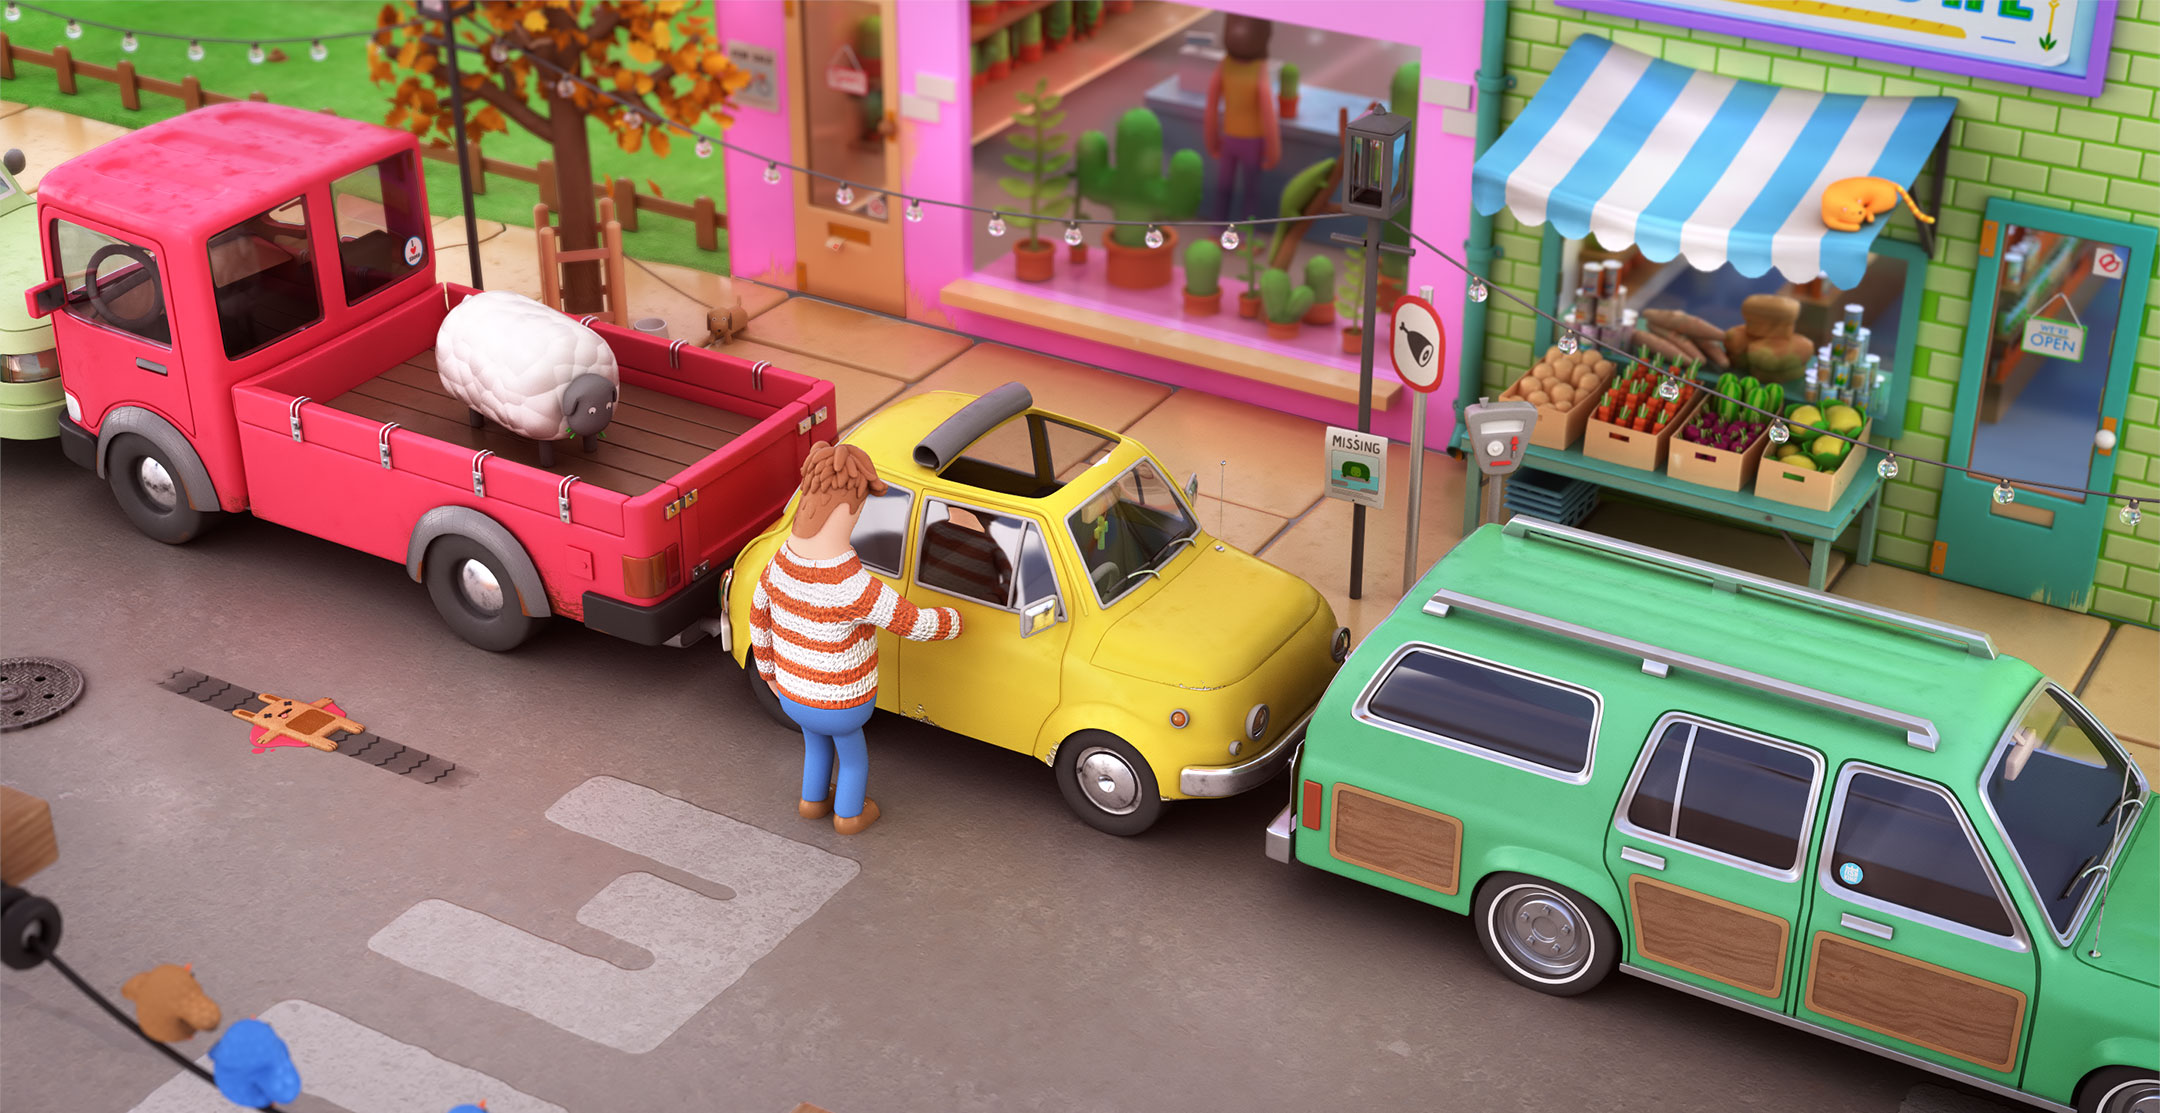 yum-yum-animation-parallel-parking@2160.jpg